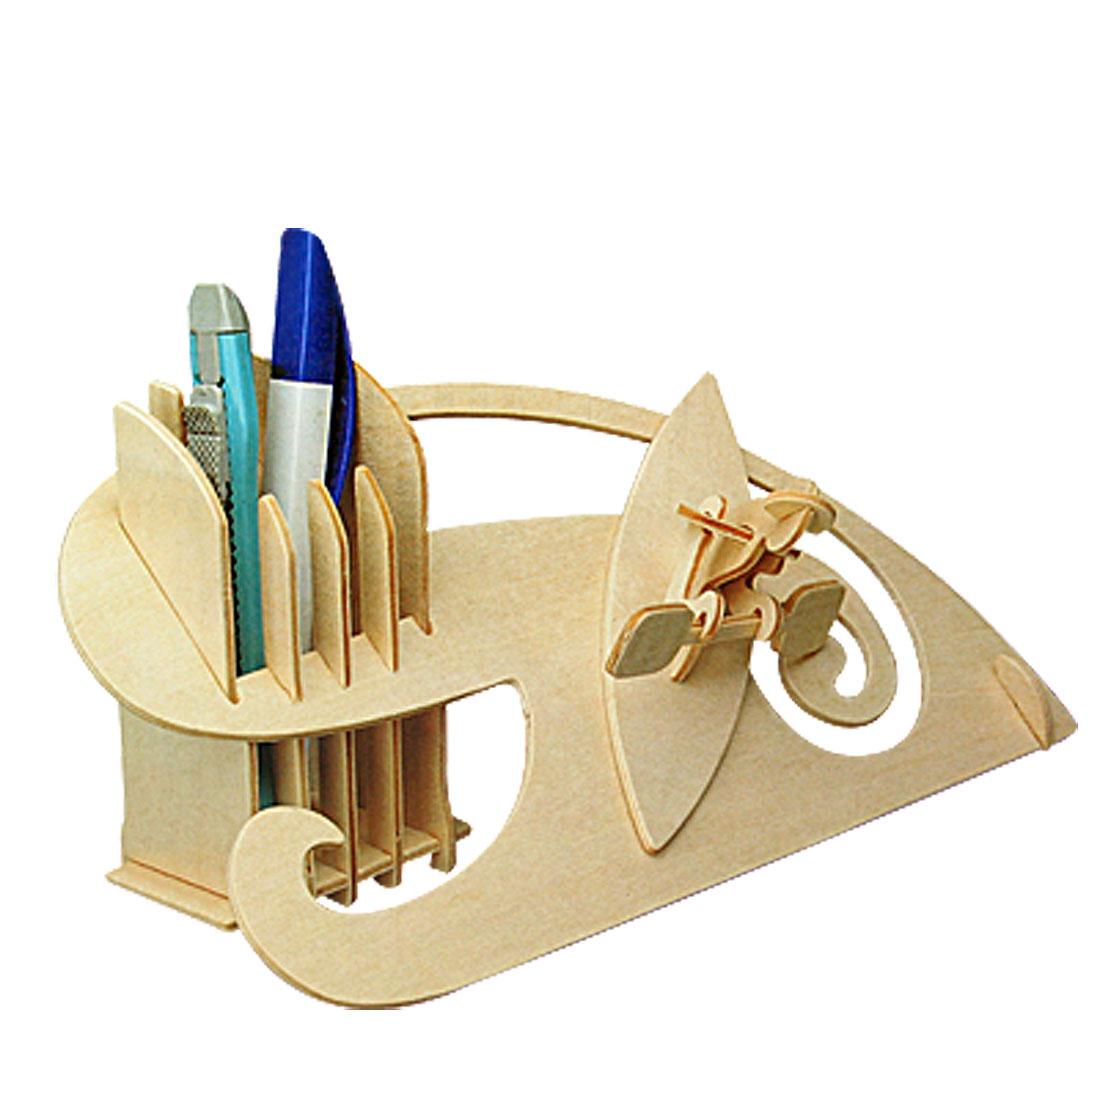 Kayak Pen Container Wooden Construction Kit Holder New